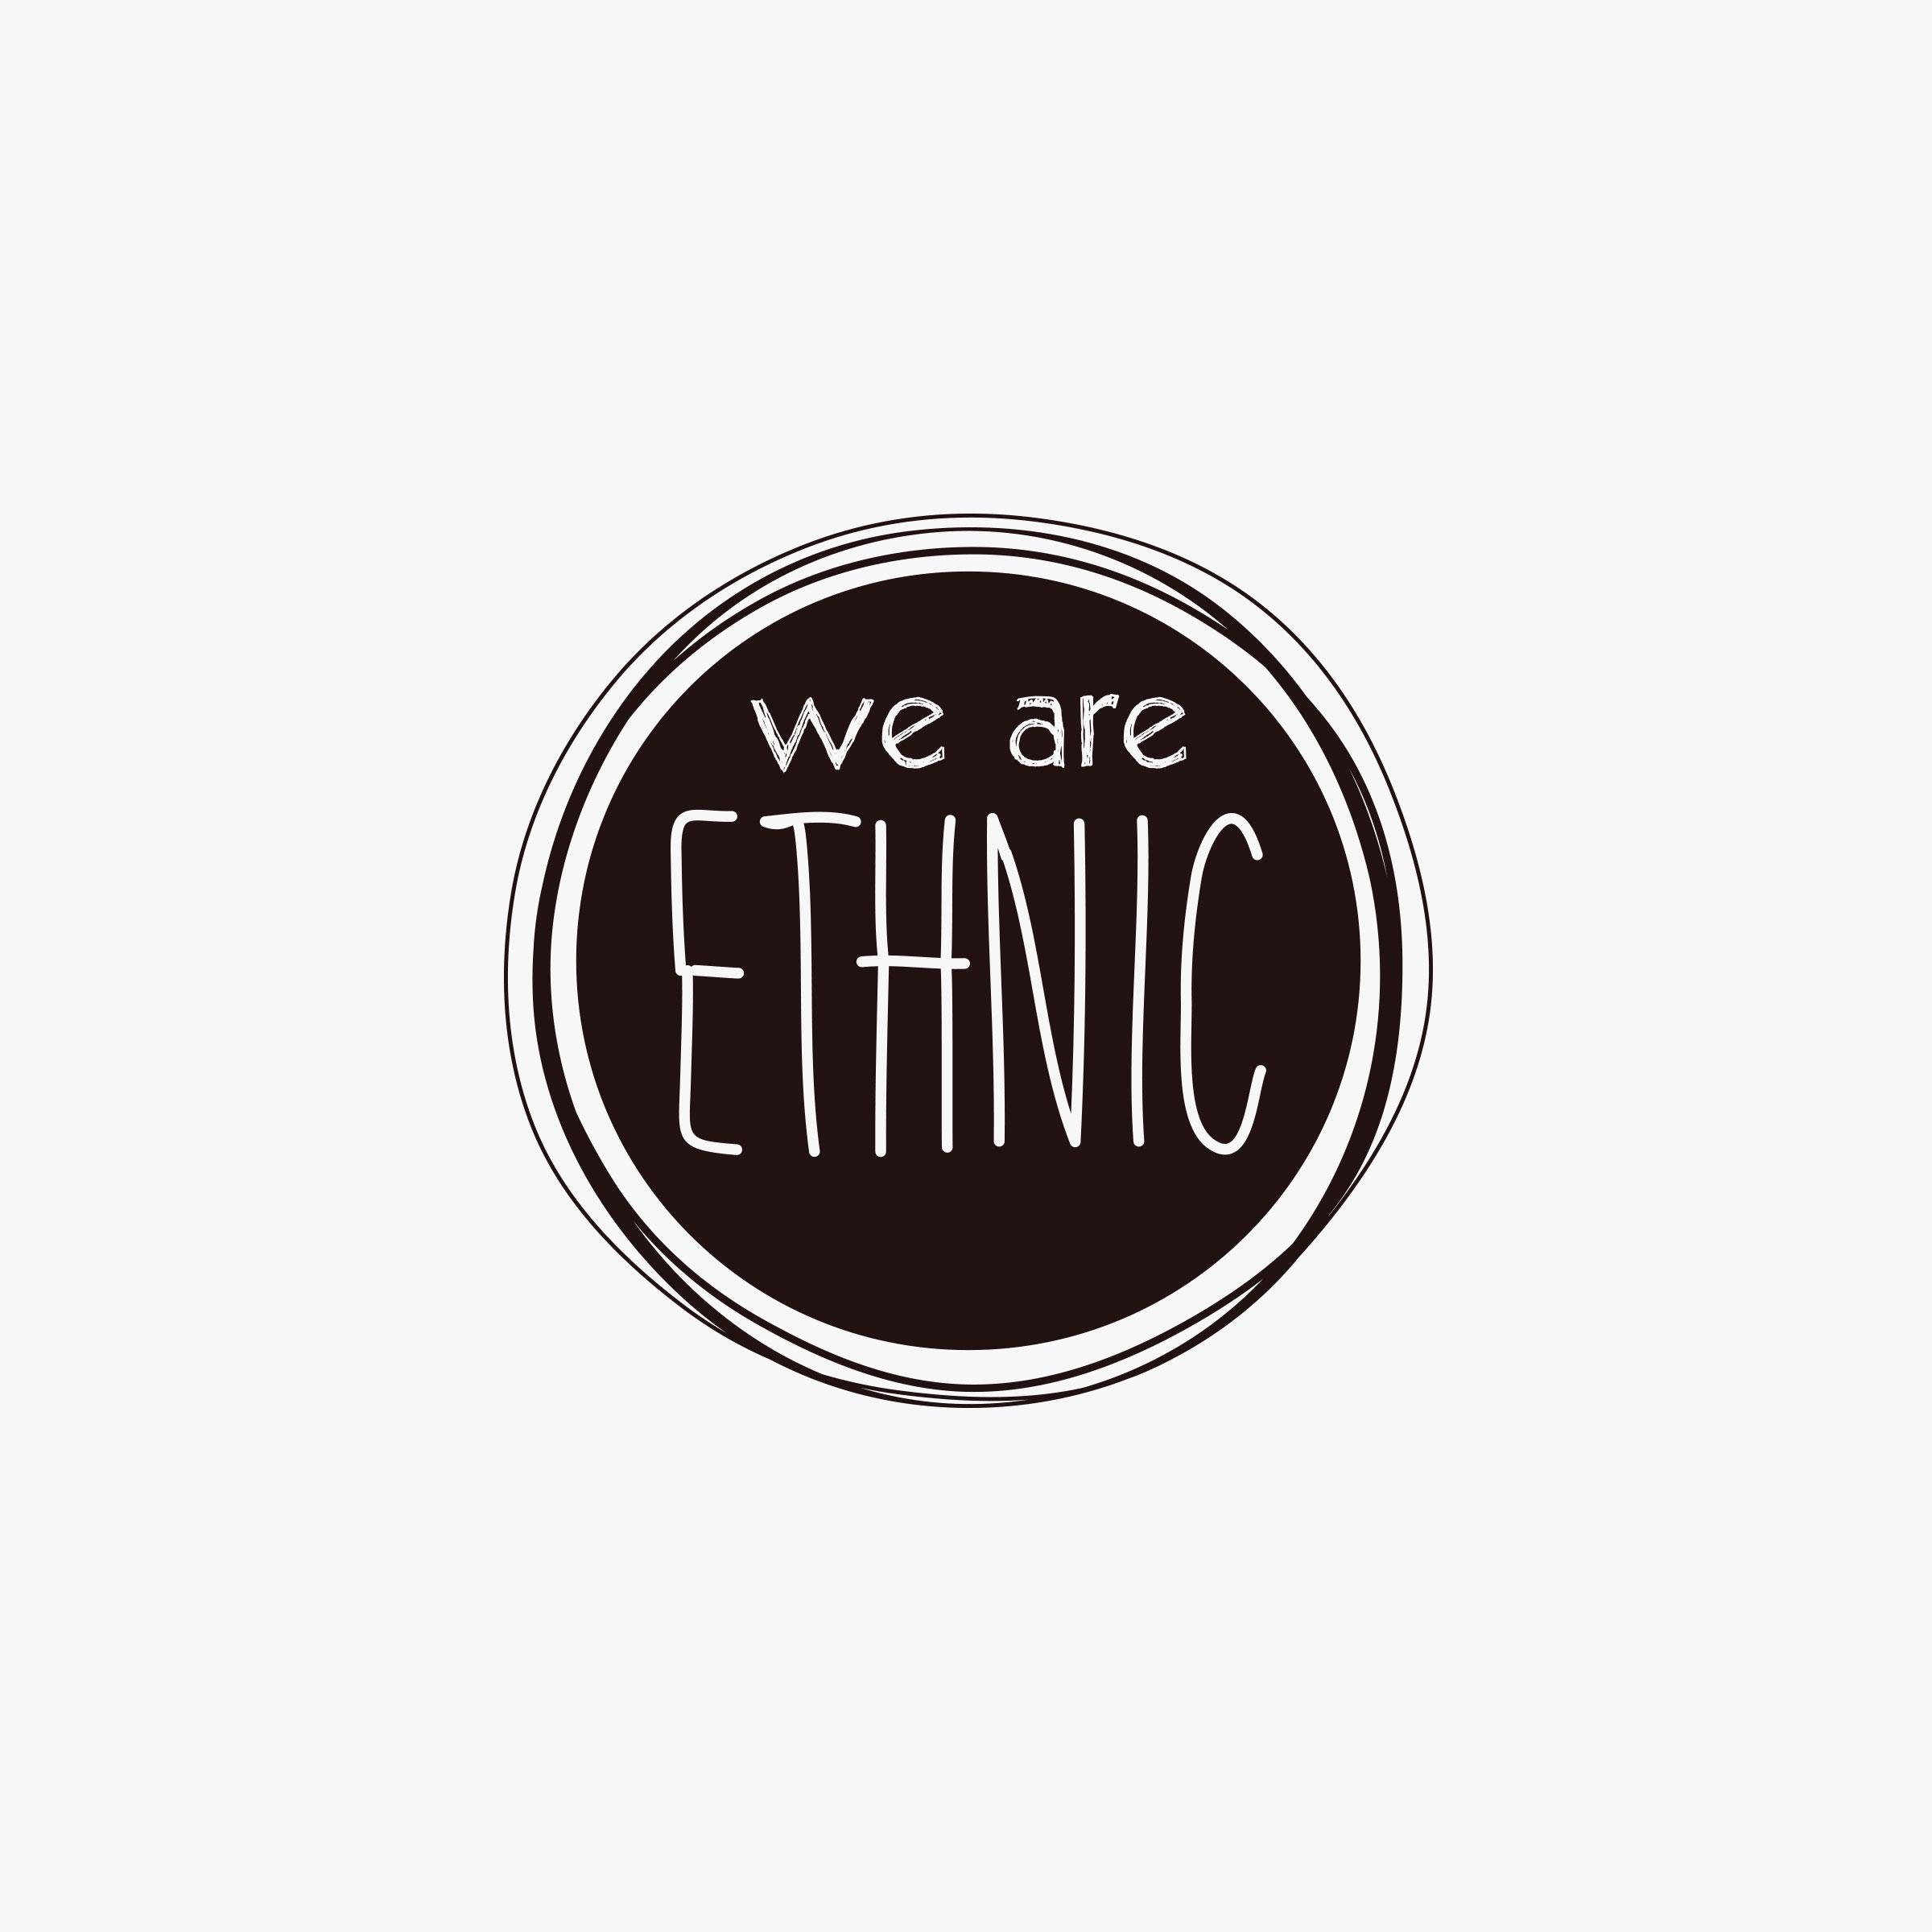 we-are-ethnic-logo-design-by-create.jpg